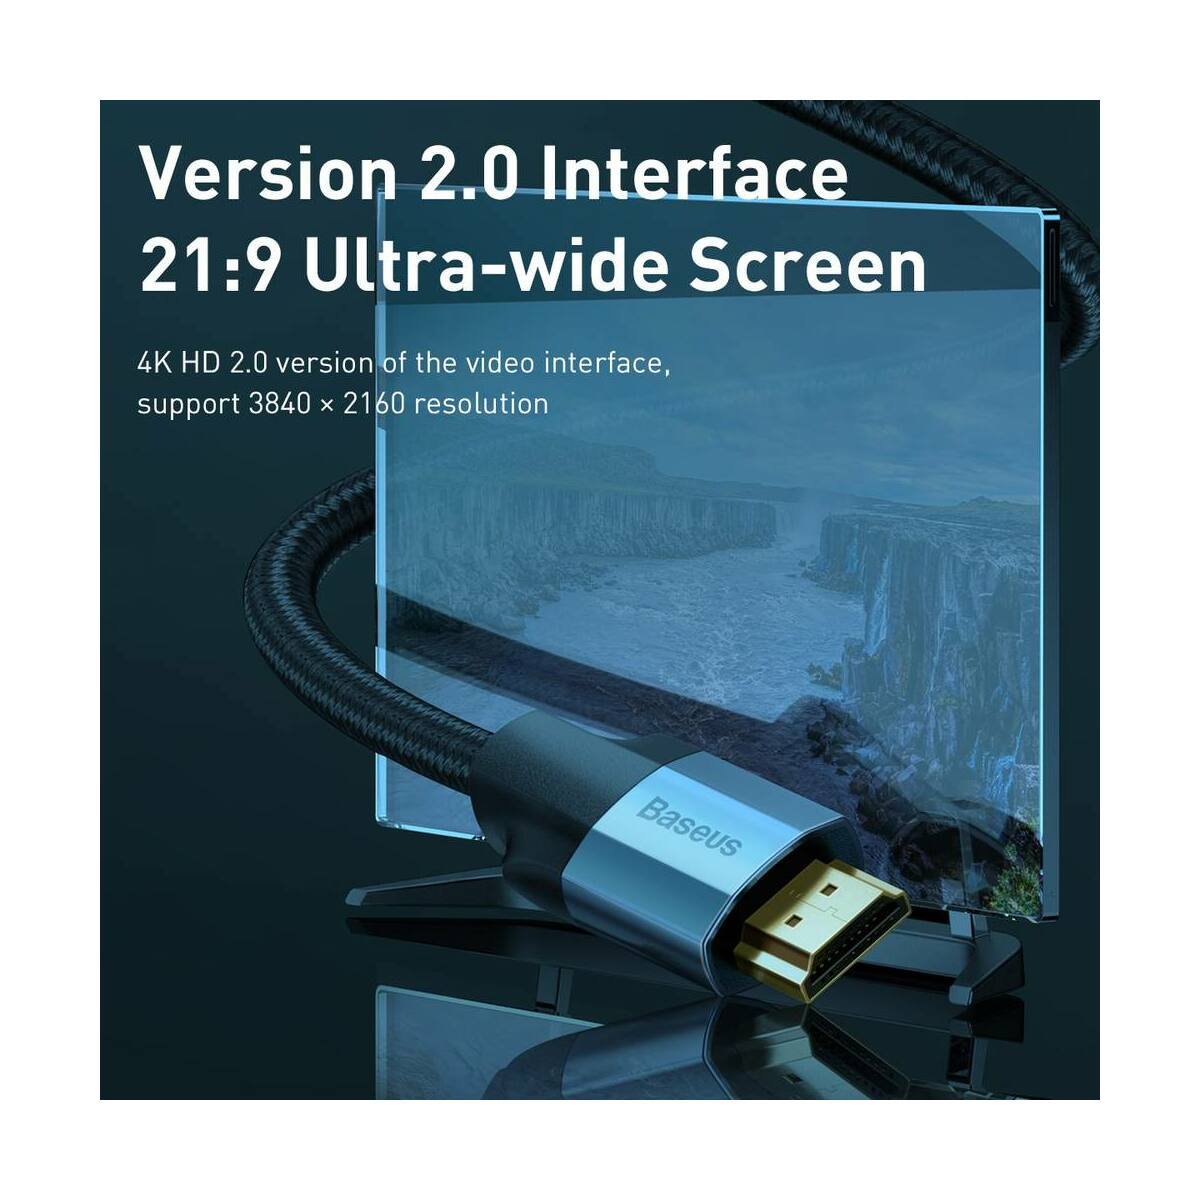 Baseus Video kábel Enjoyment Series 4KHD [apa] - 4KHD [apa] 5m, szürke (CAKSX-E0G)